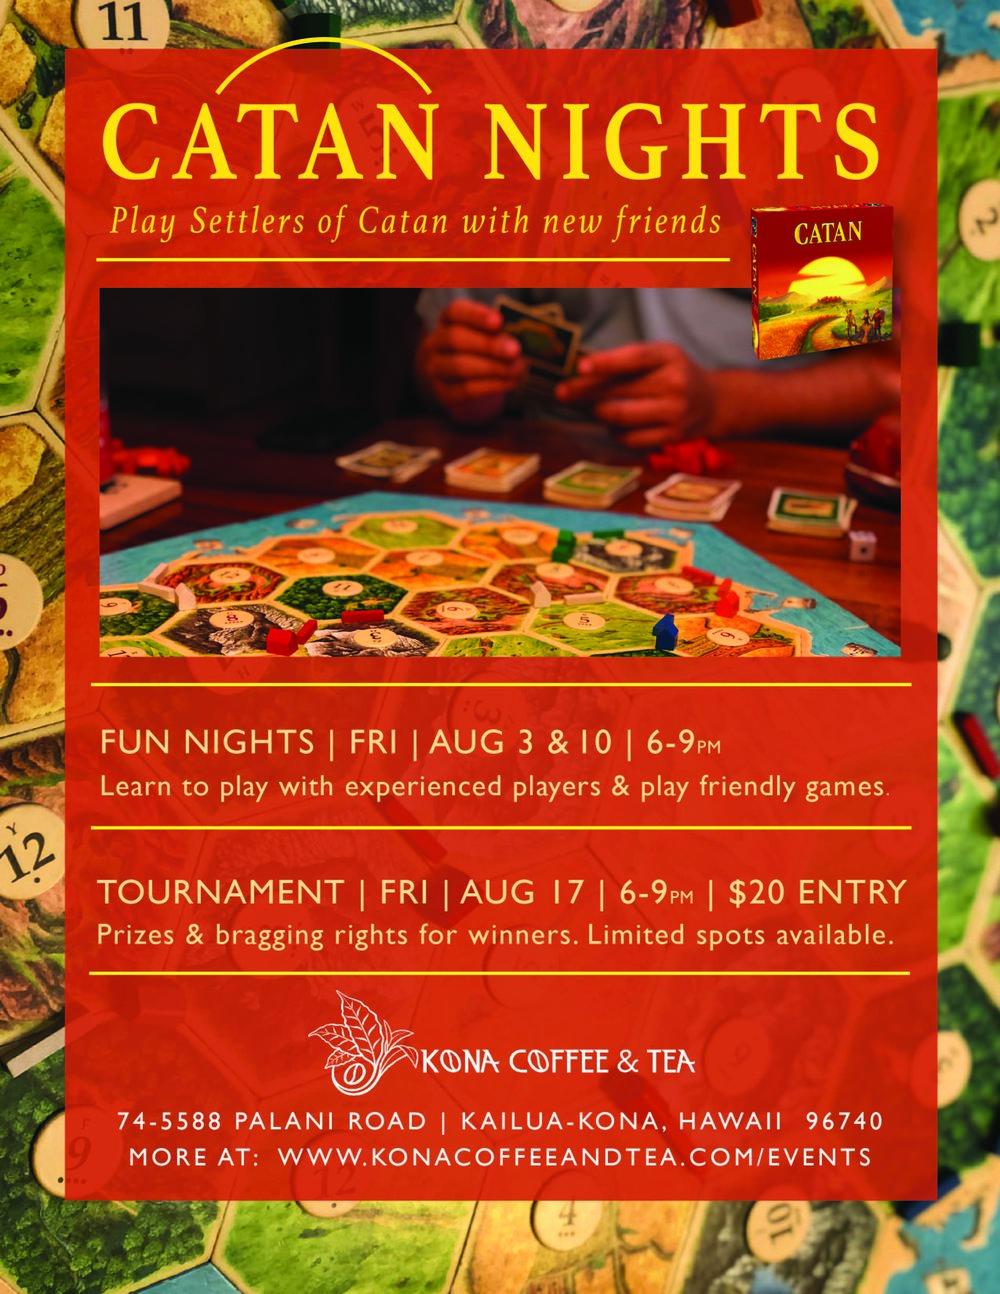 Catan Nights_KCTC_Aug 2018-01-01.jpg